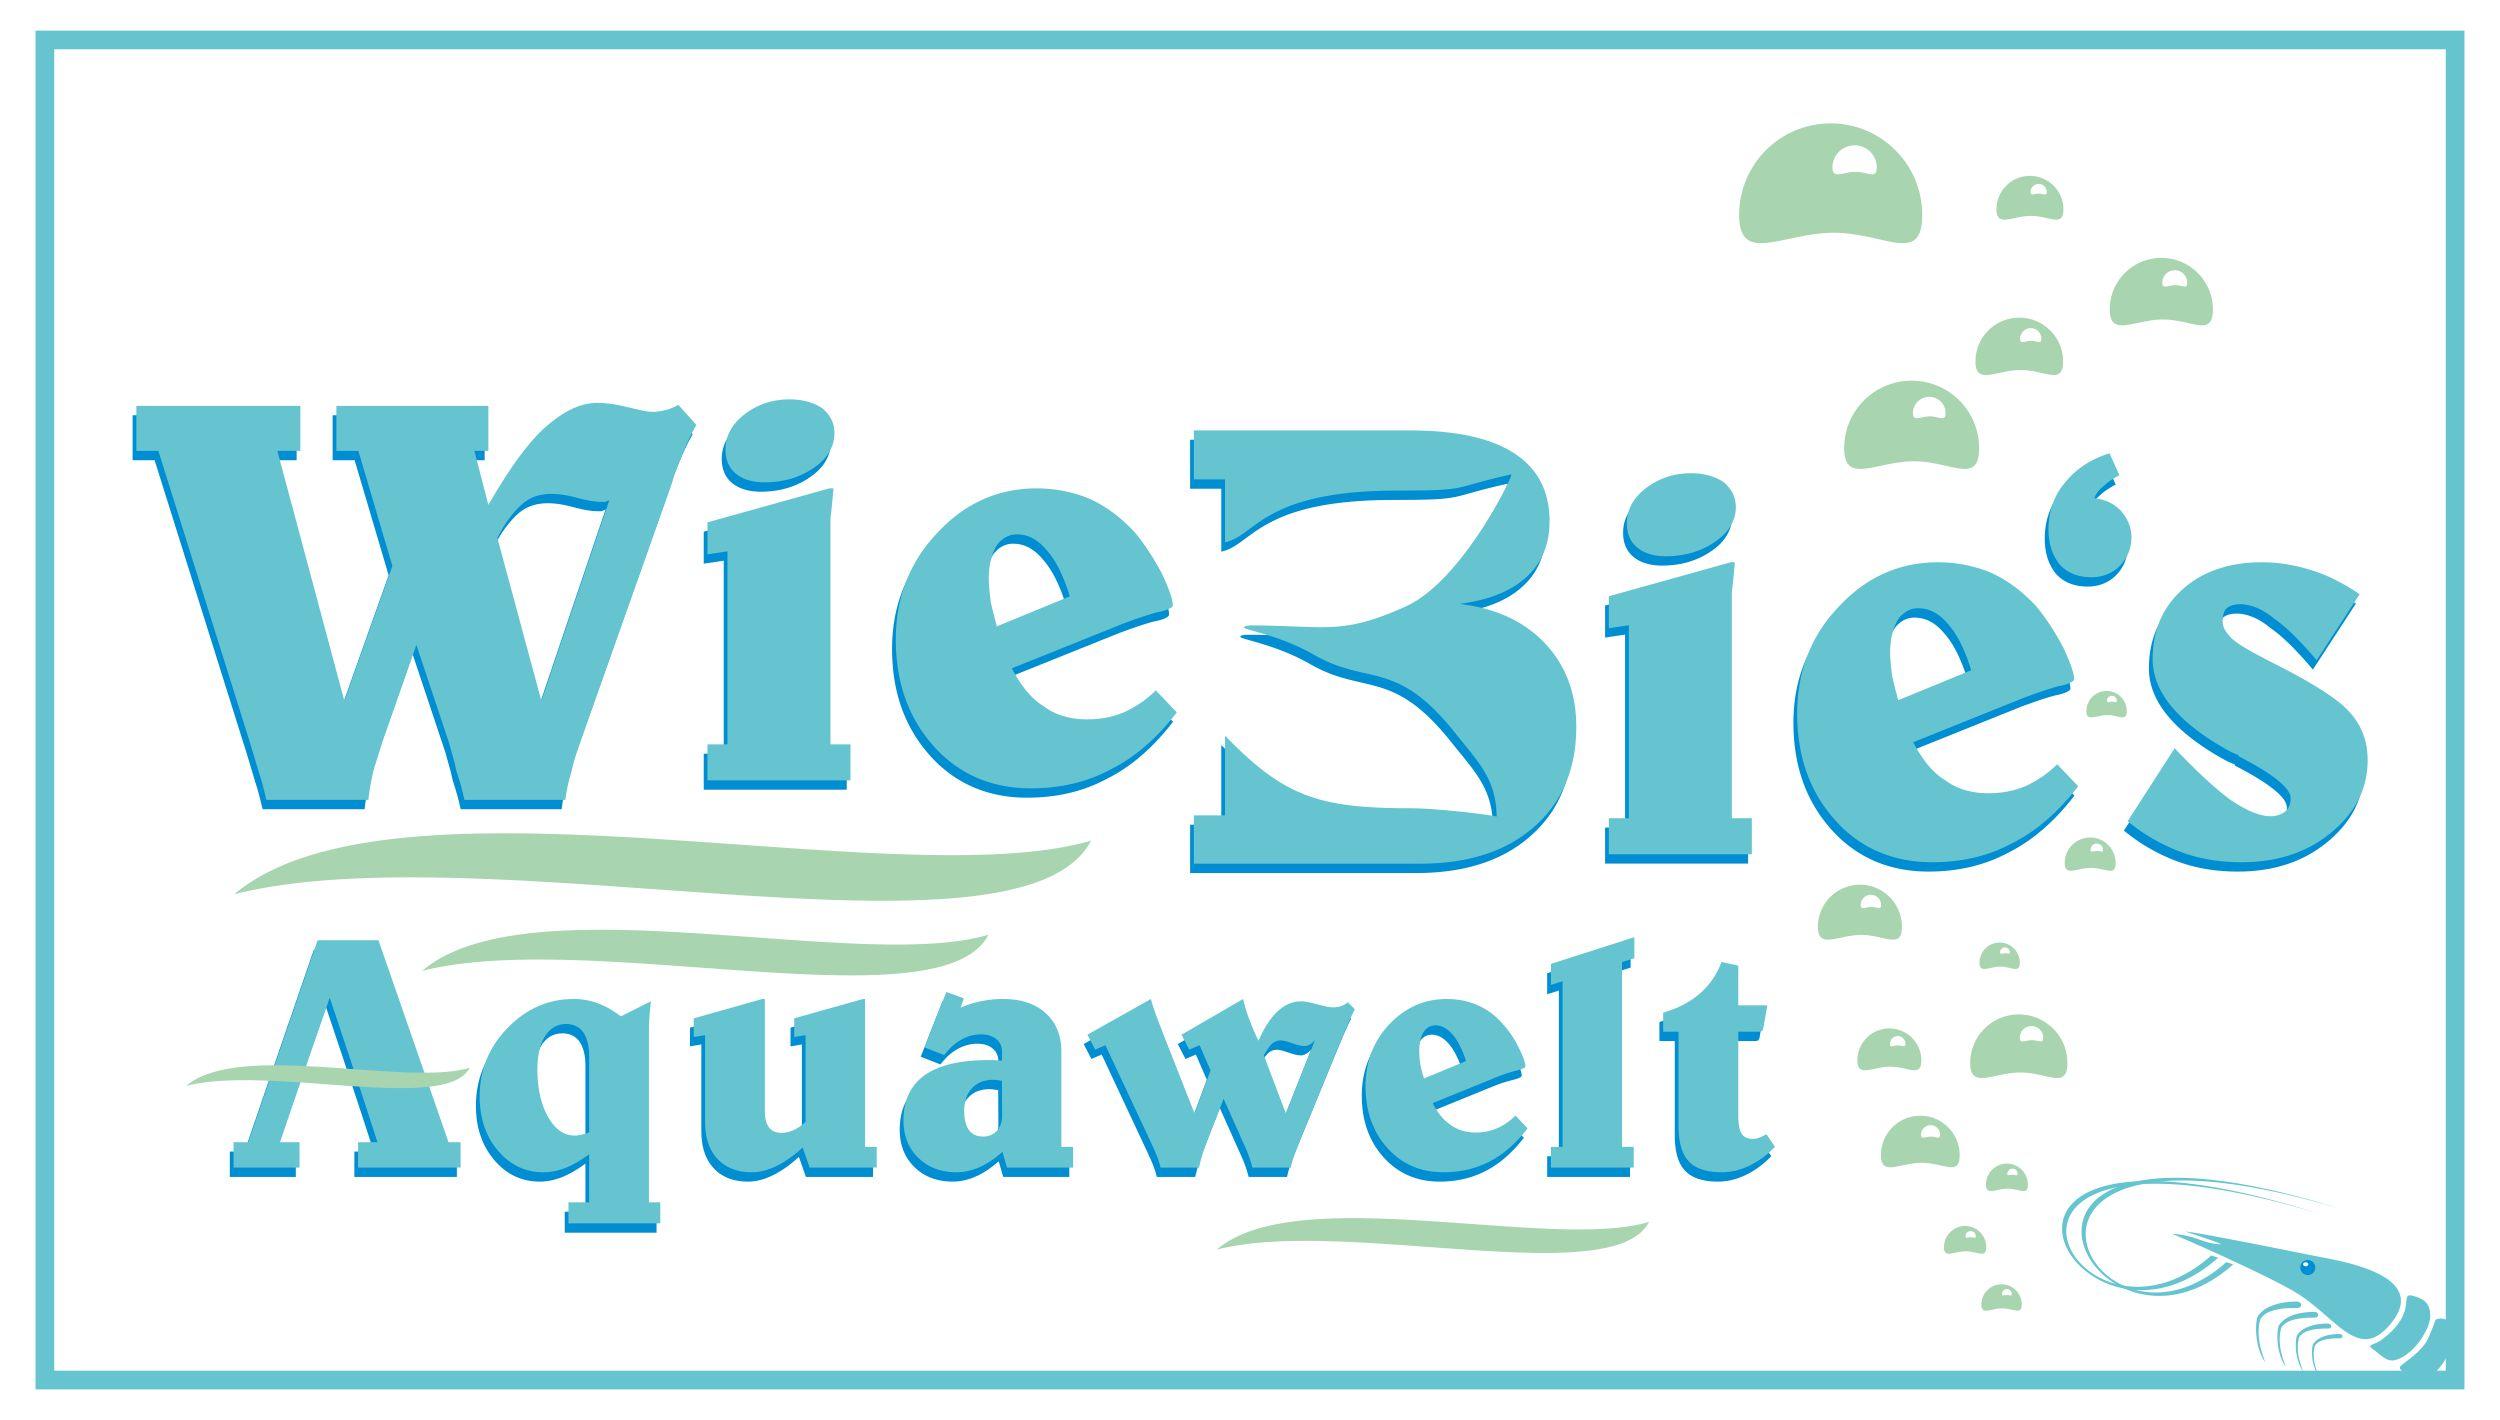 Wiebes Aquawelt